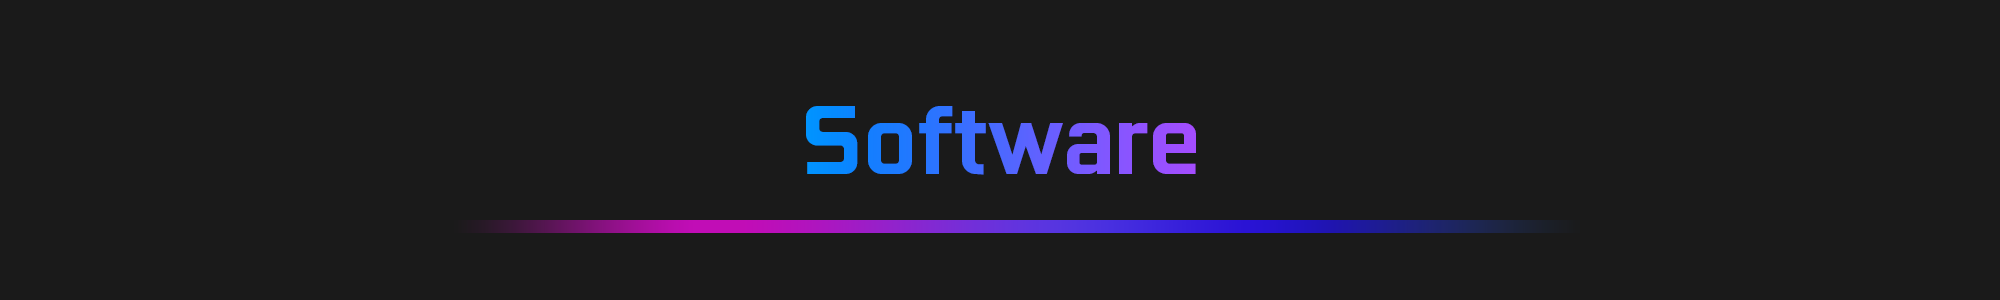 Softwaretitle.png